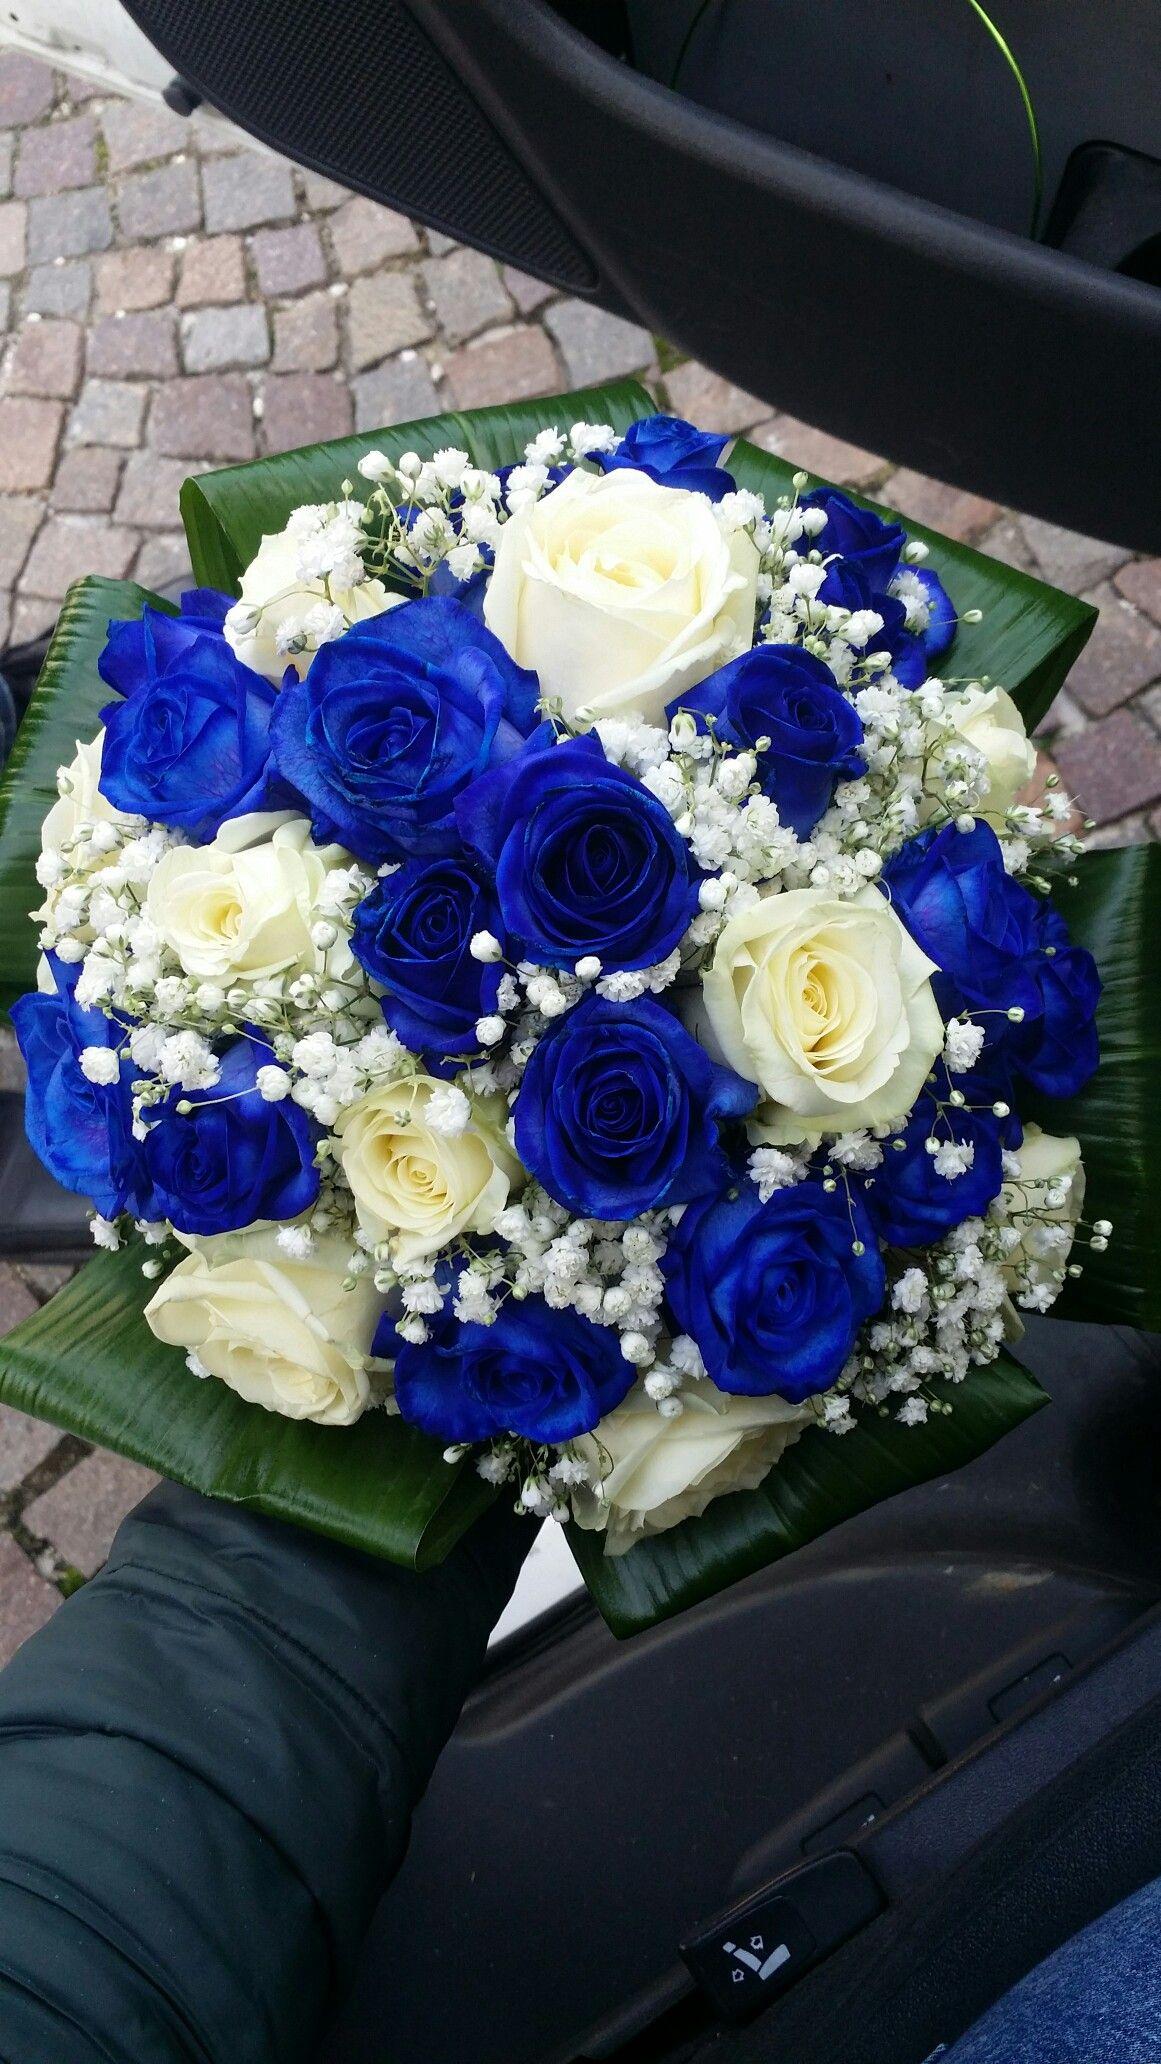 Bouquet Sposa Con Rose Bianche E Blu.Bouquet Con Rose Blu E Bianche Piu Gypsophila Fioreria